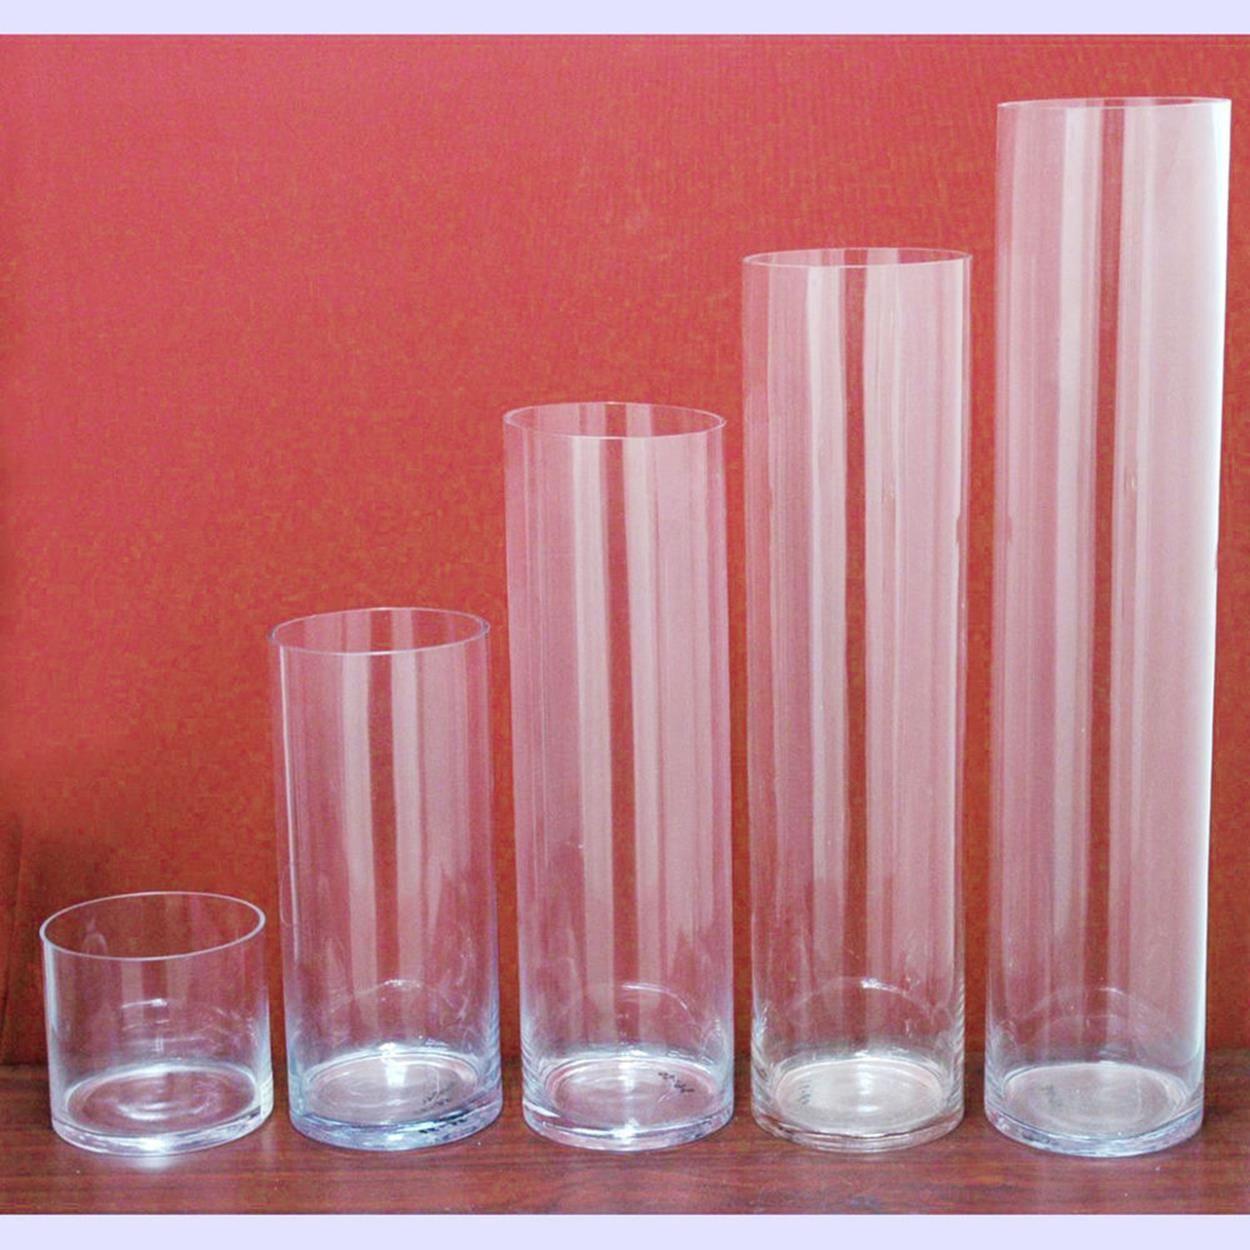 tall glass vase centerpiece ideas of 37 beautiful tall clear vase centerpiece ideas pinterest vase with tall clear vase centerpiece ideas 32